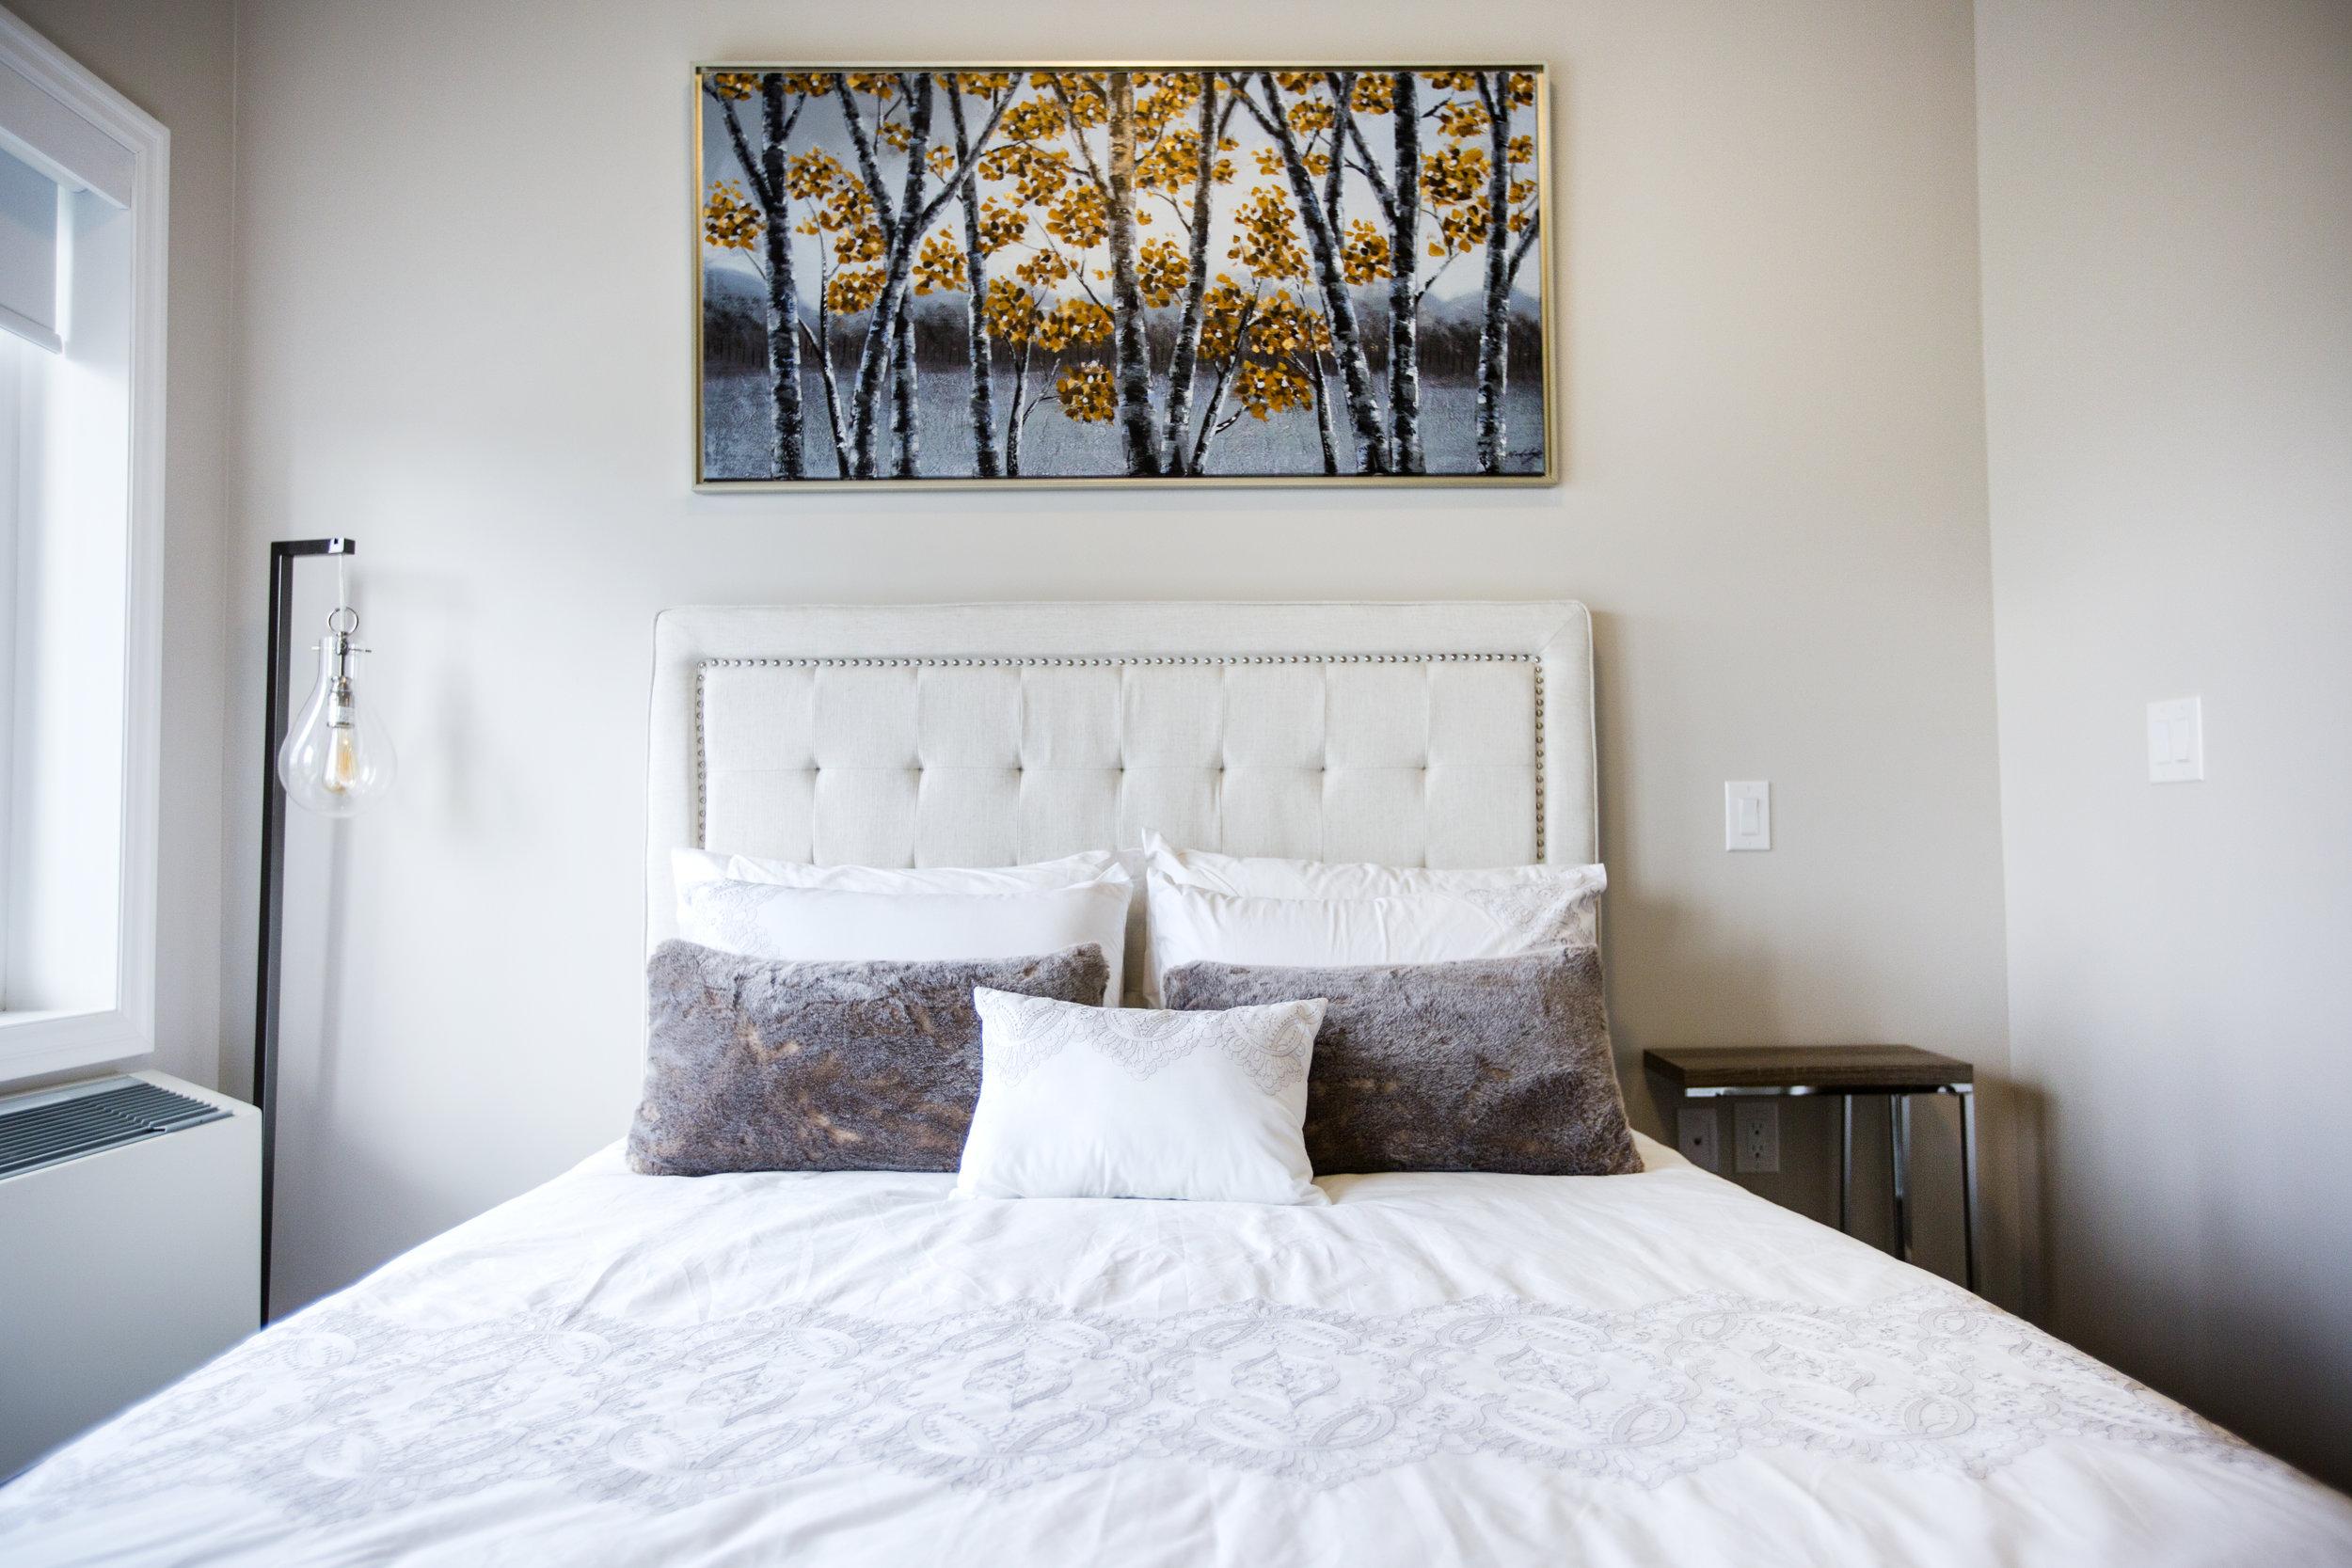 retirement-home-suite-bed.jpg